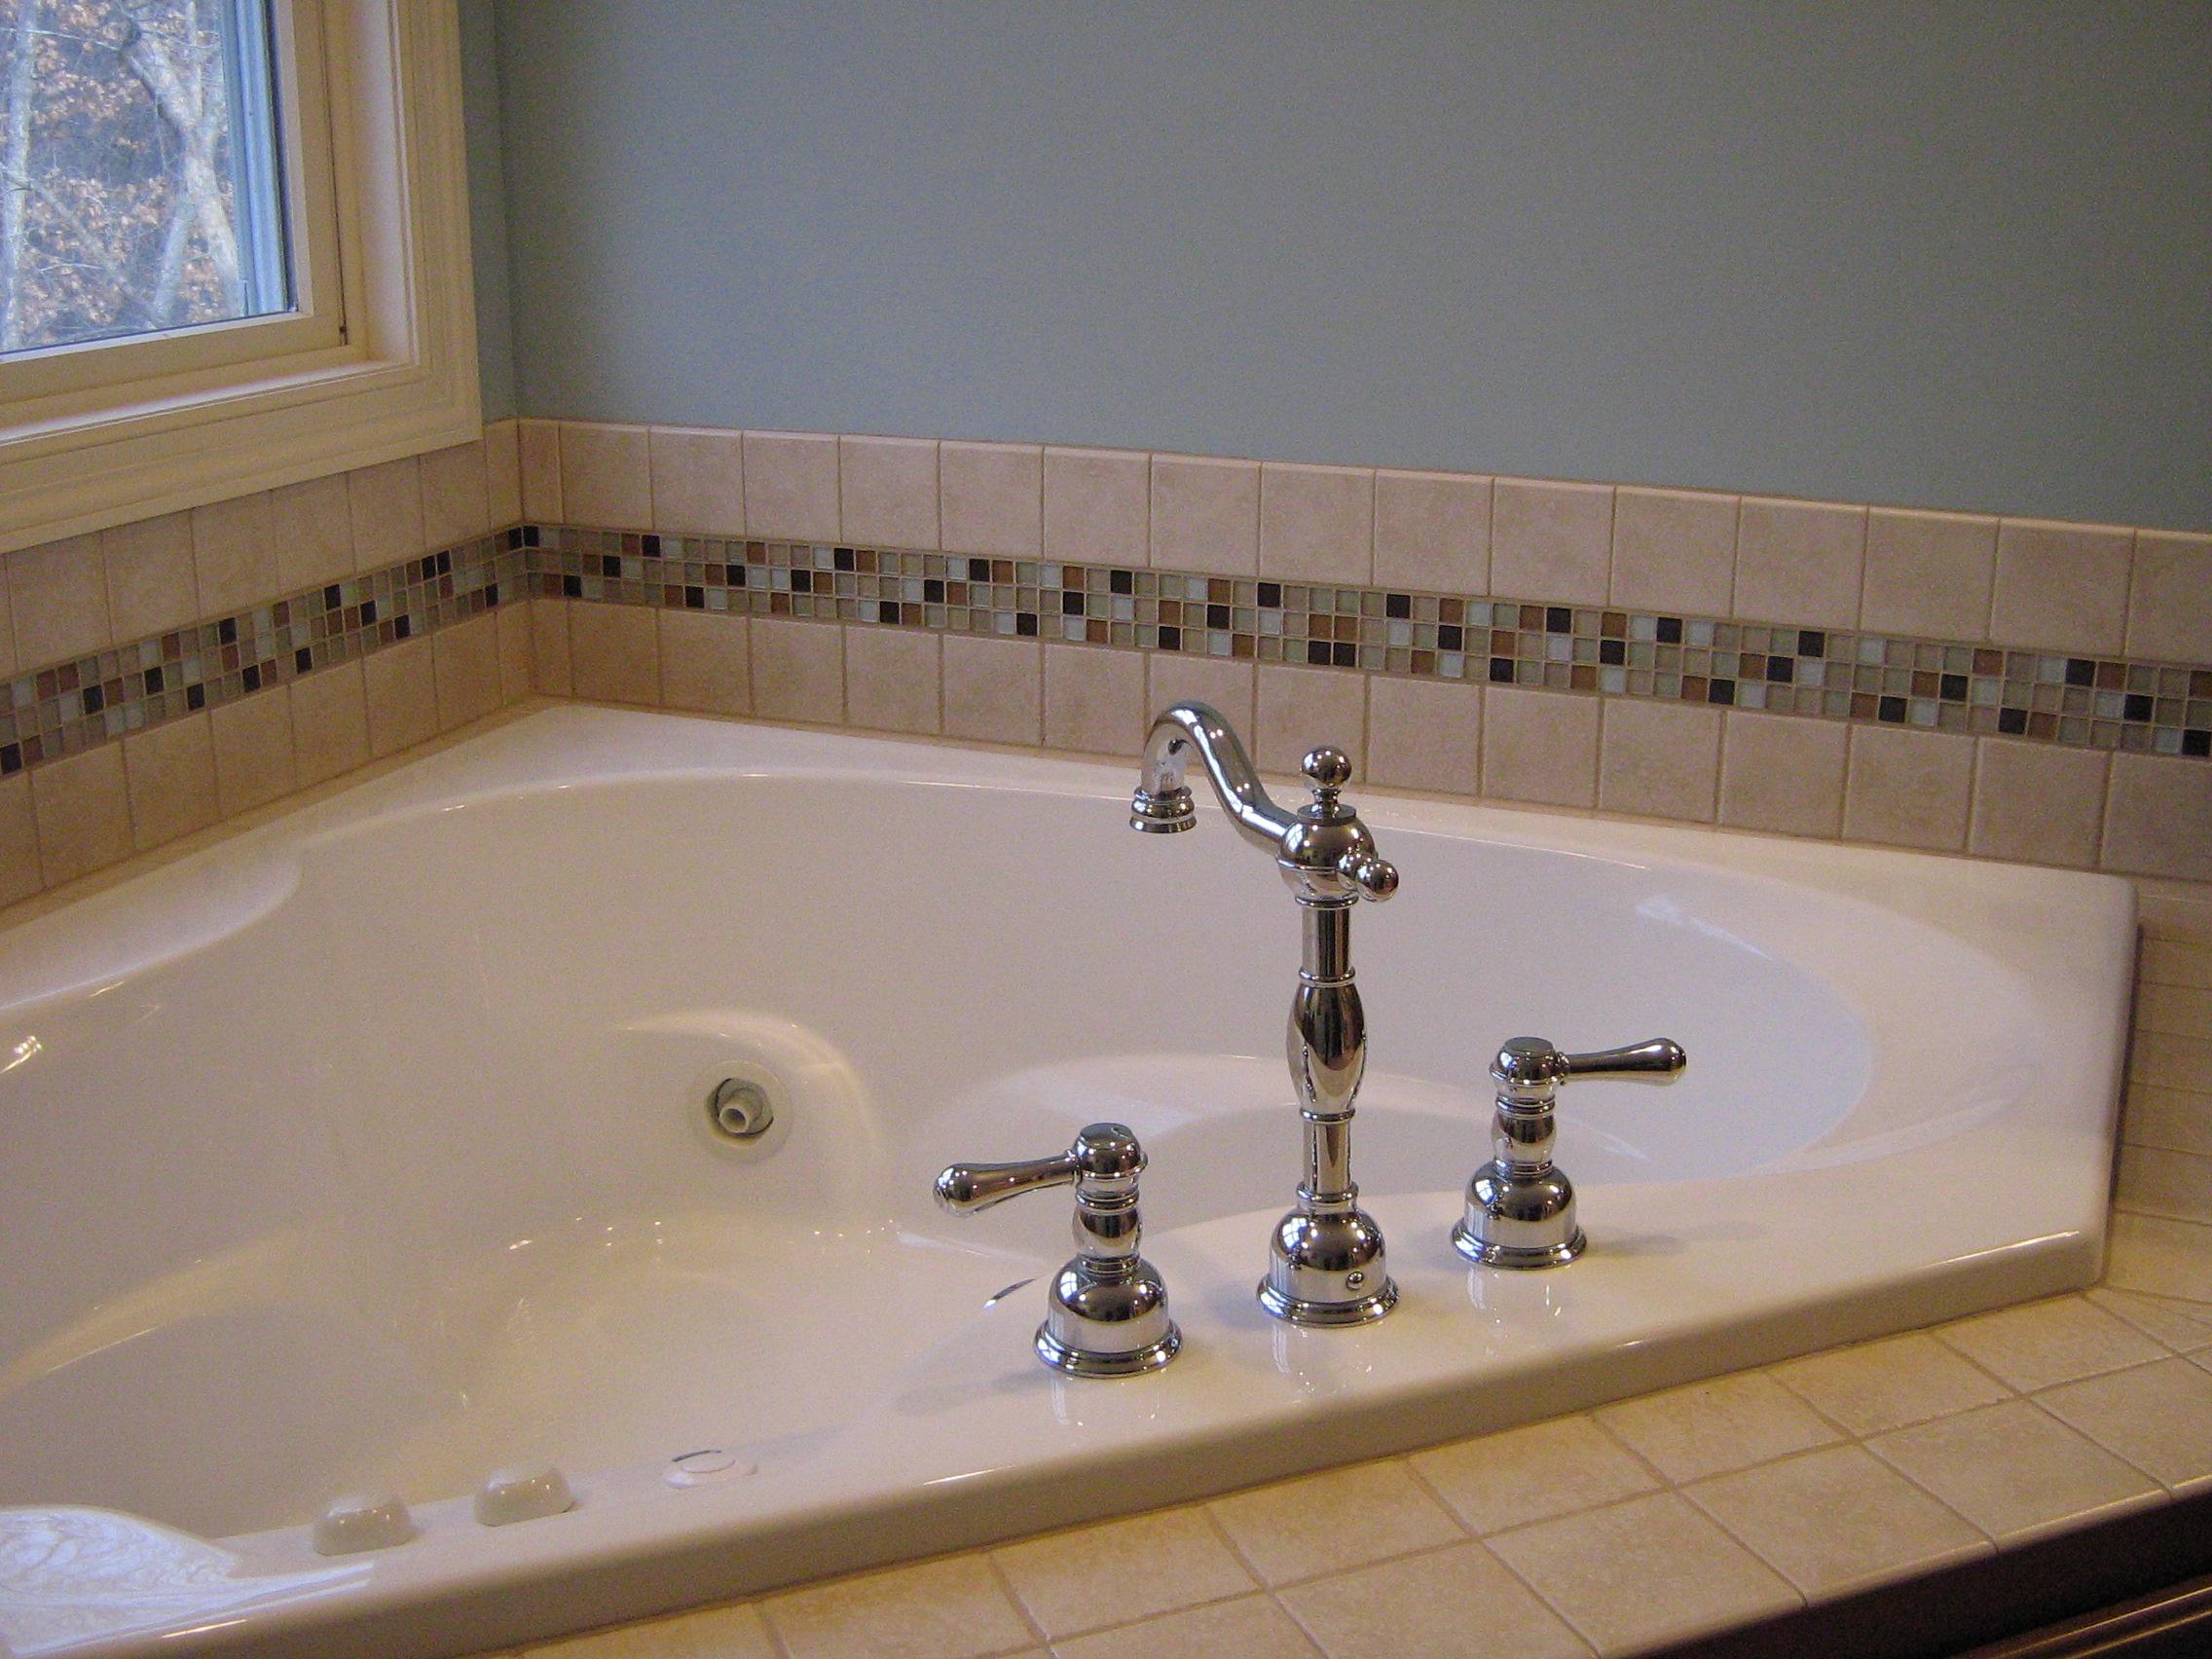 Minimum Investment Maximum Impact Bath Tubs Tans and Mosaic Tiles